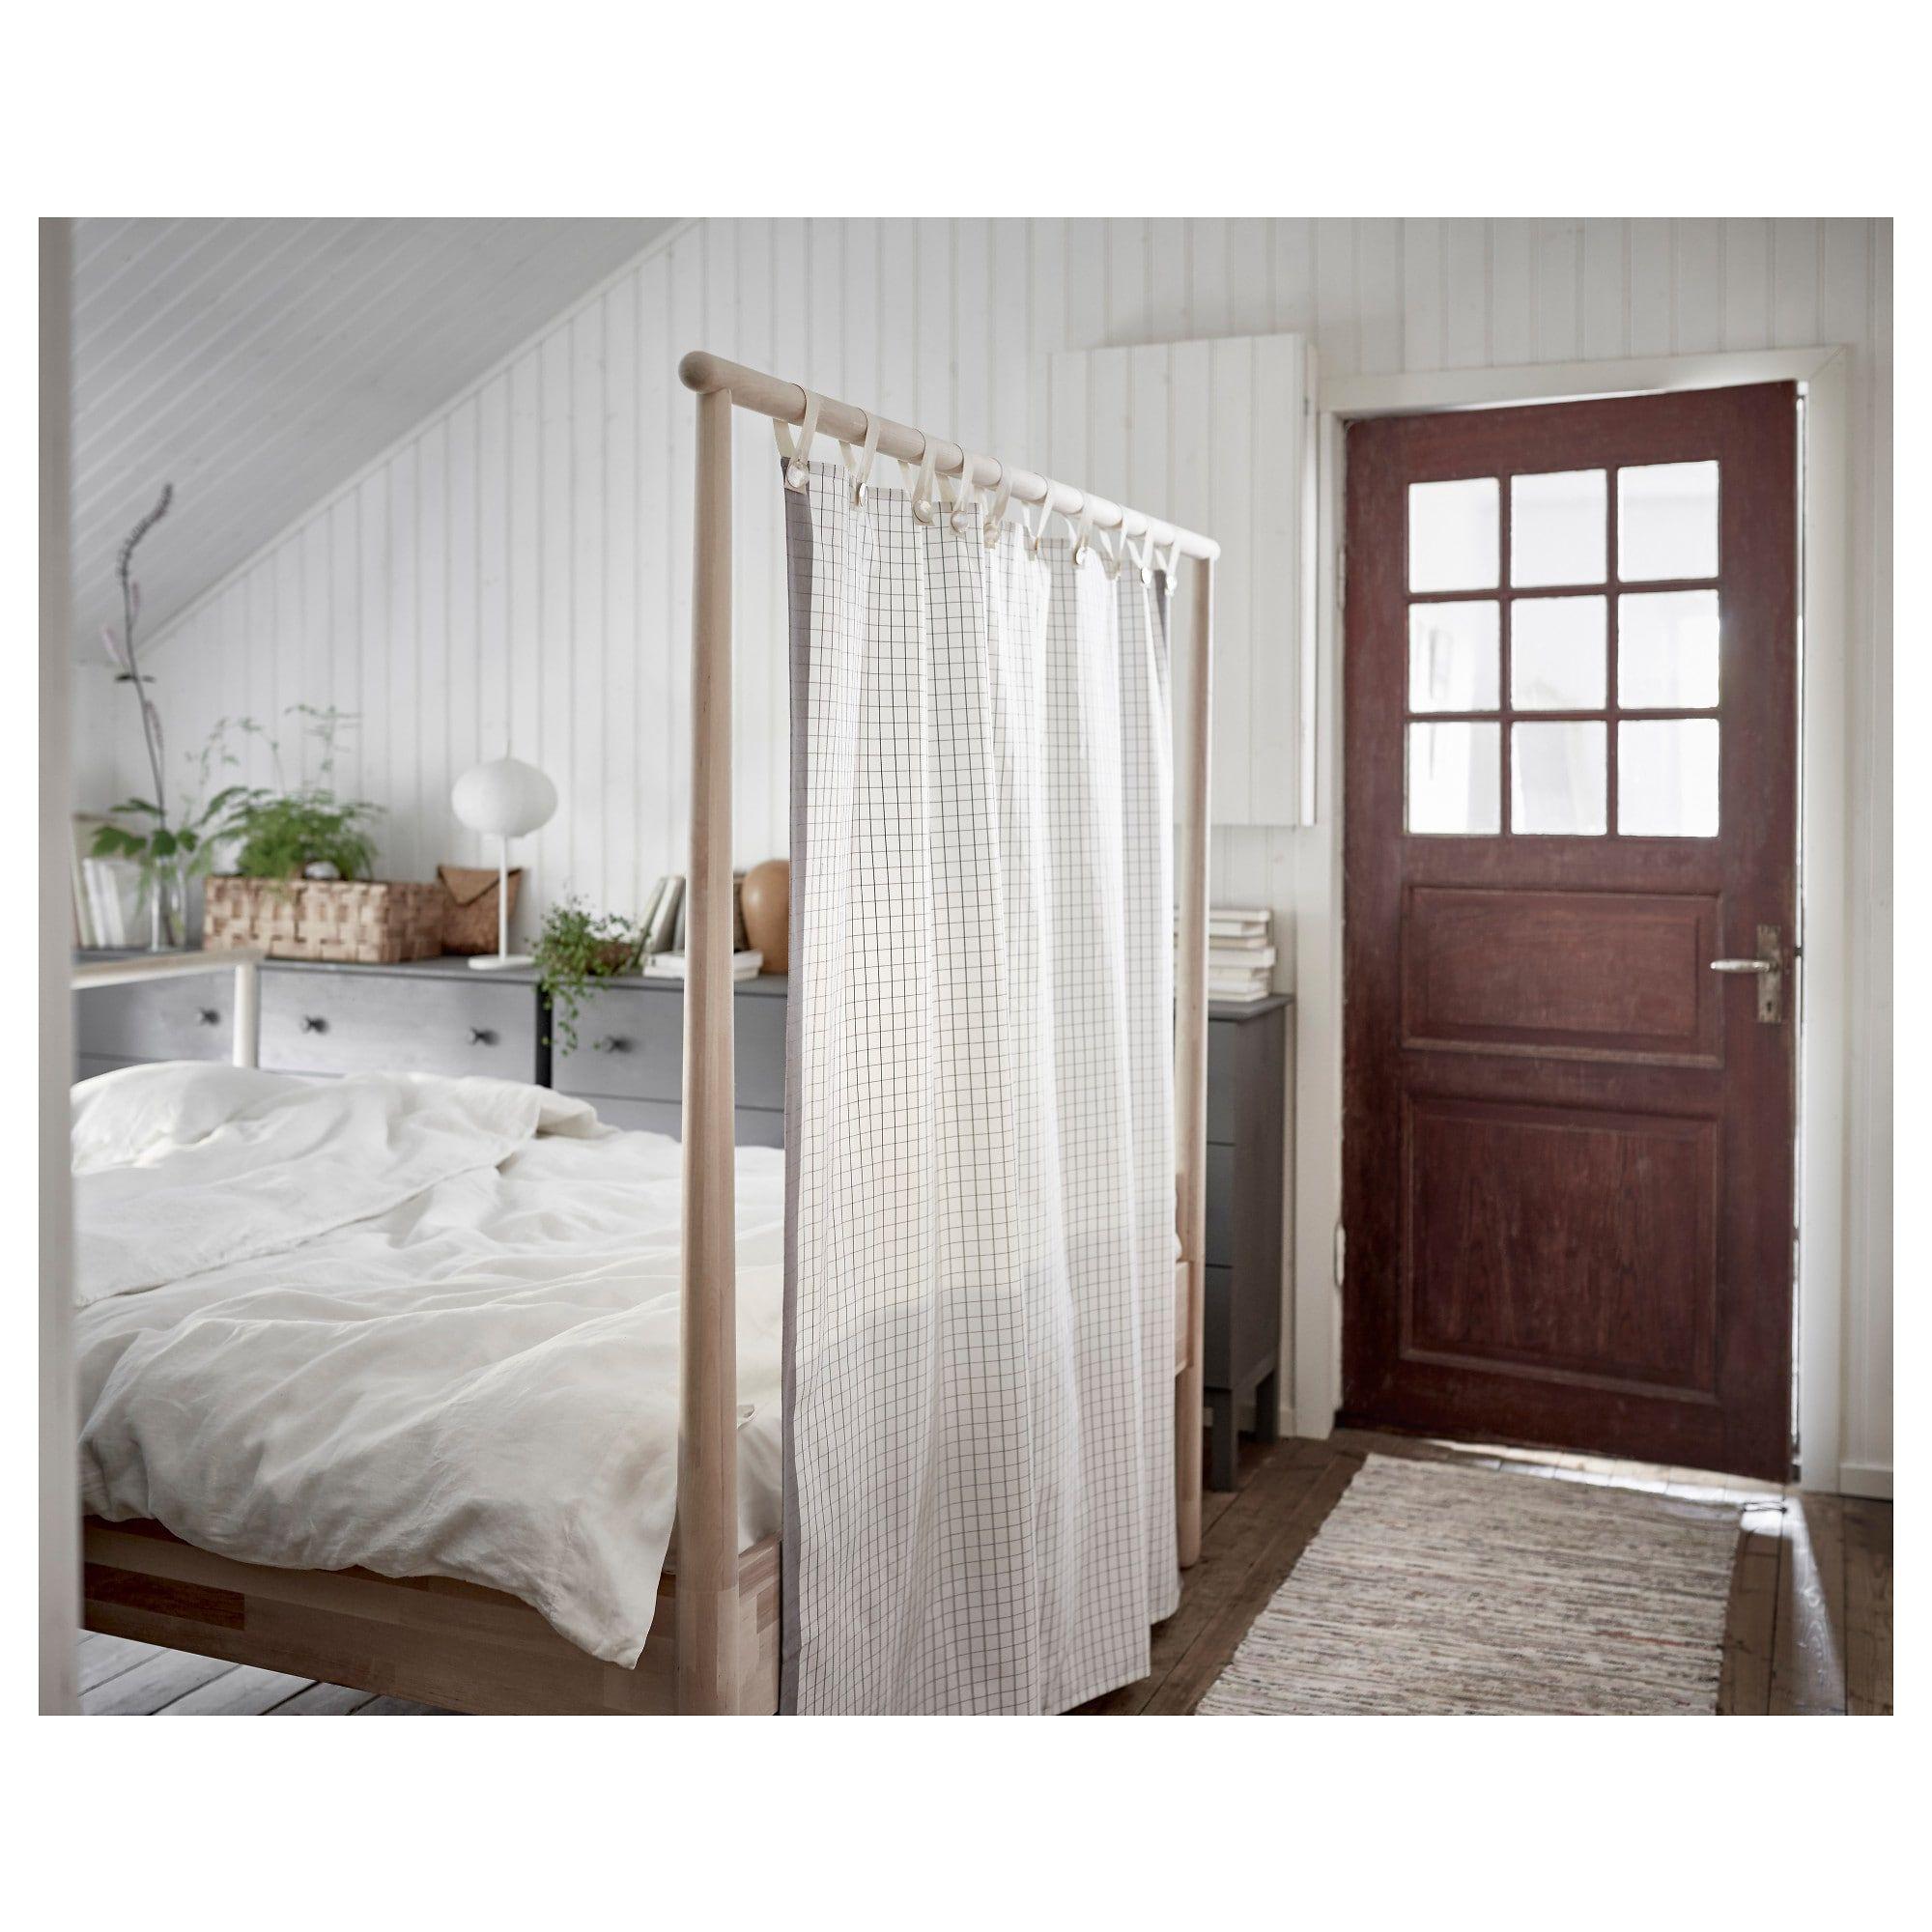 GJÖRA Bed frame - birch, Lönset Queen | Bed frame, Full ...